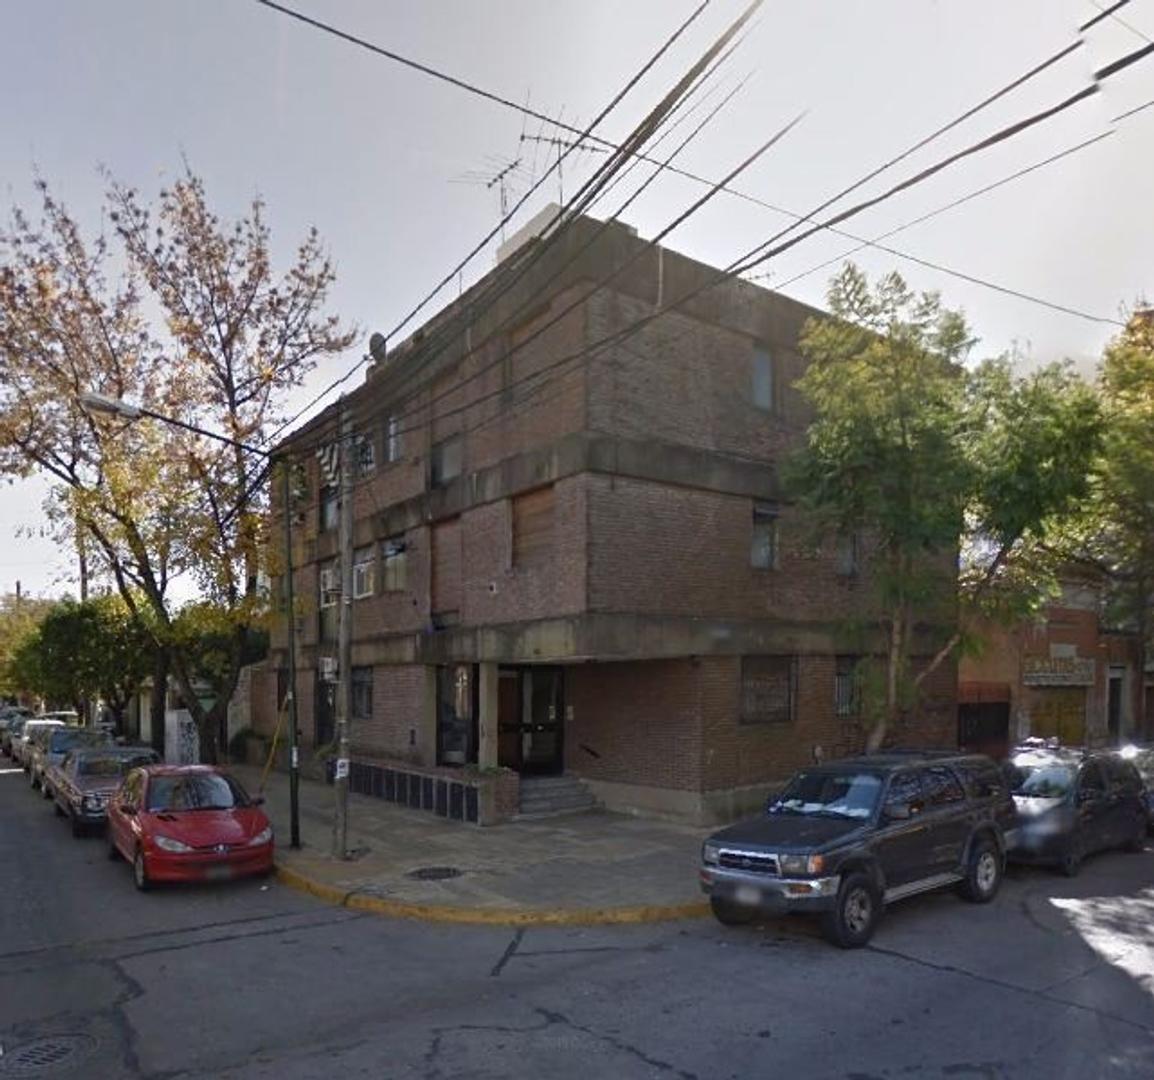 departamento 2 amb. bajas expensas a 1 cuadra de Av. Centenario